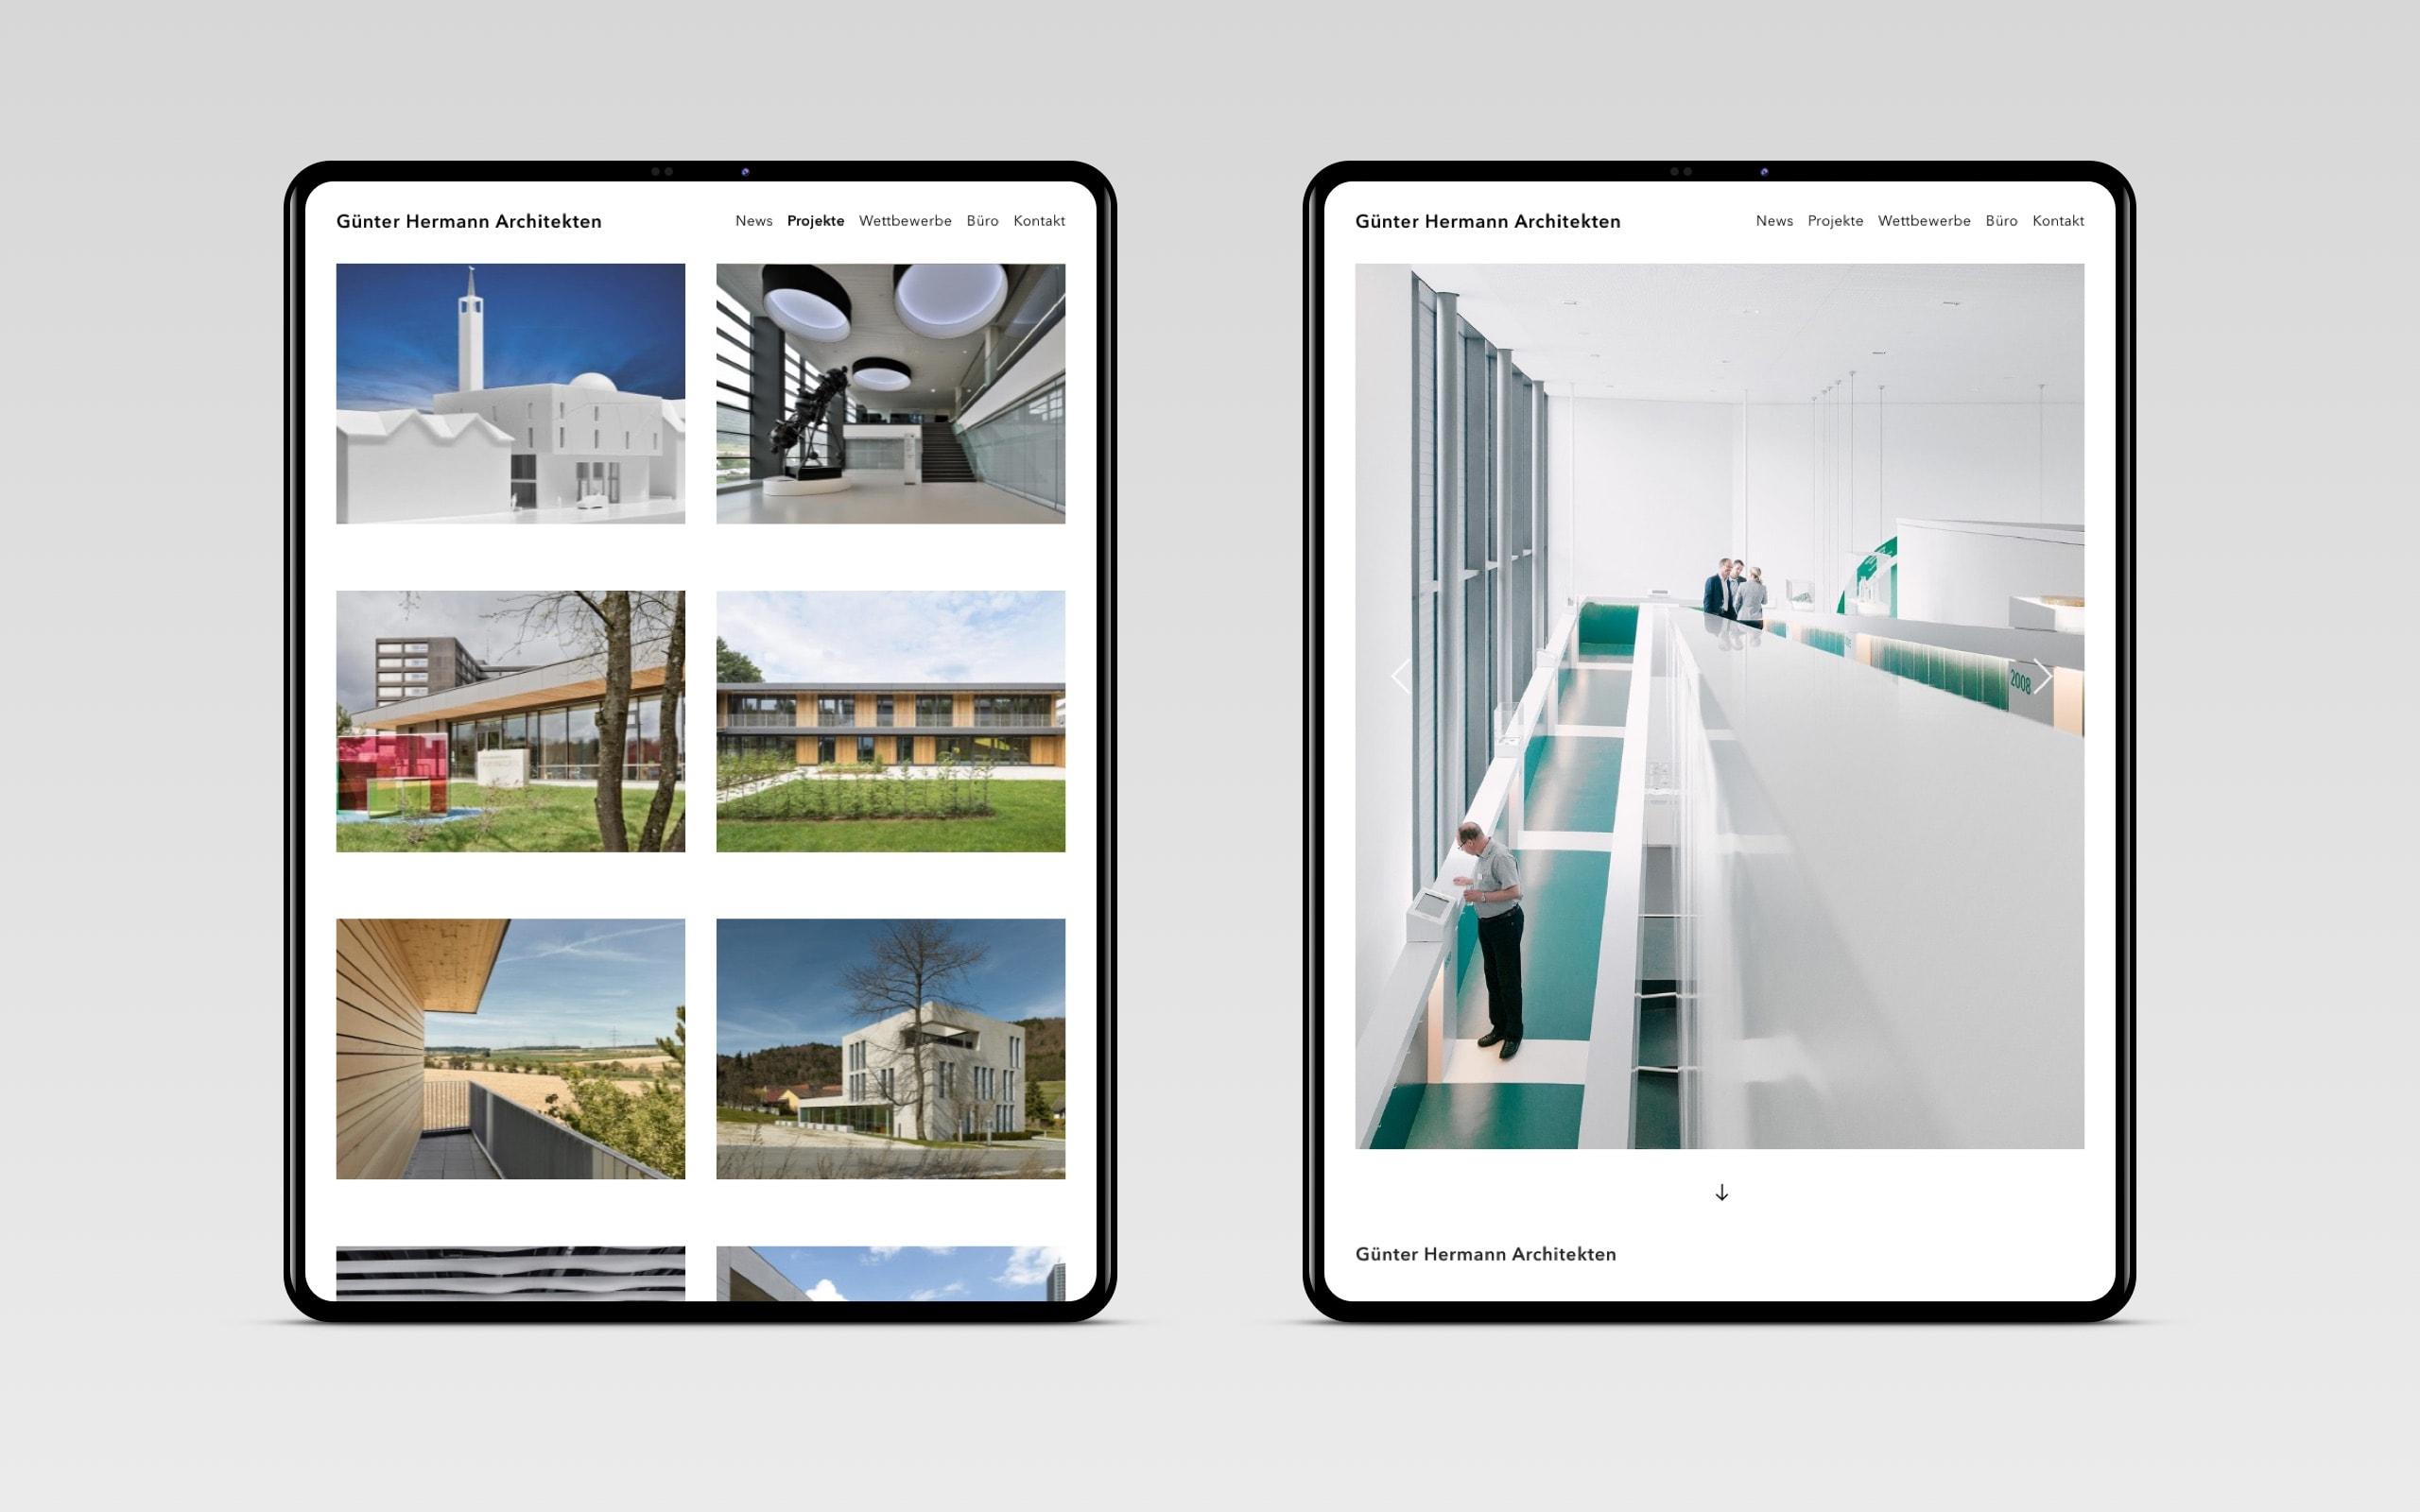 GH Architekten – Projektseiten [Tablet]